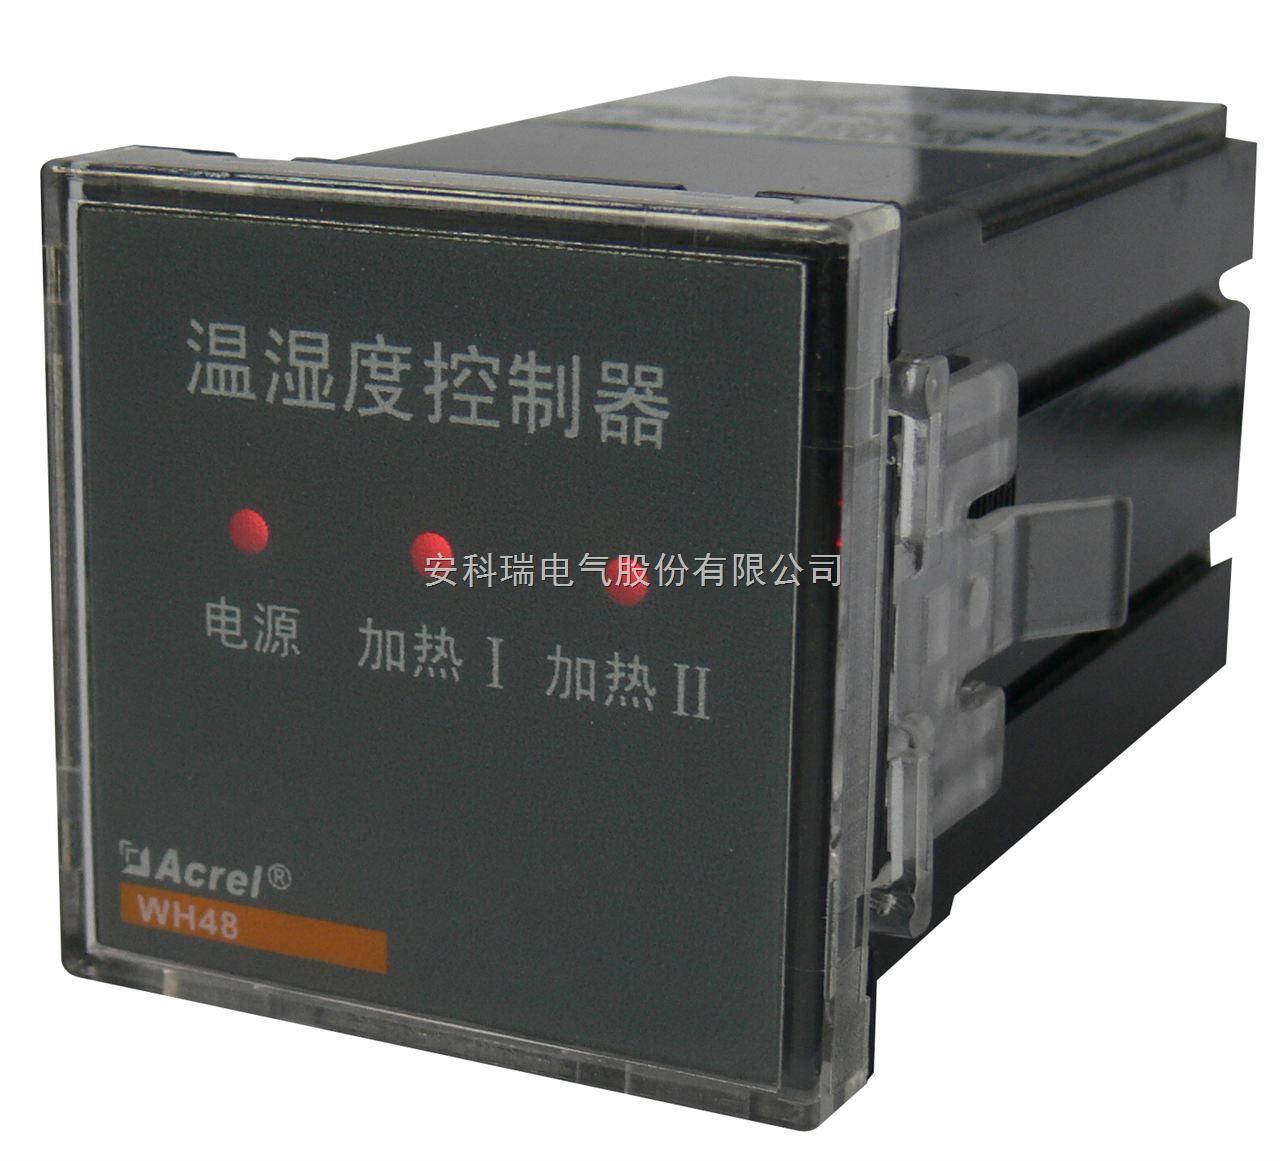 安科瑞智能型可操作温湿度控制器WHD48-11价格